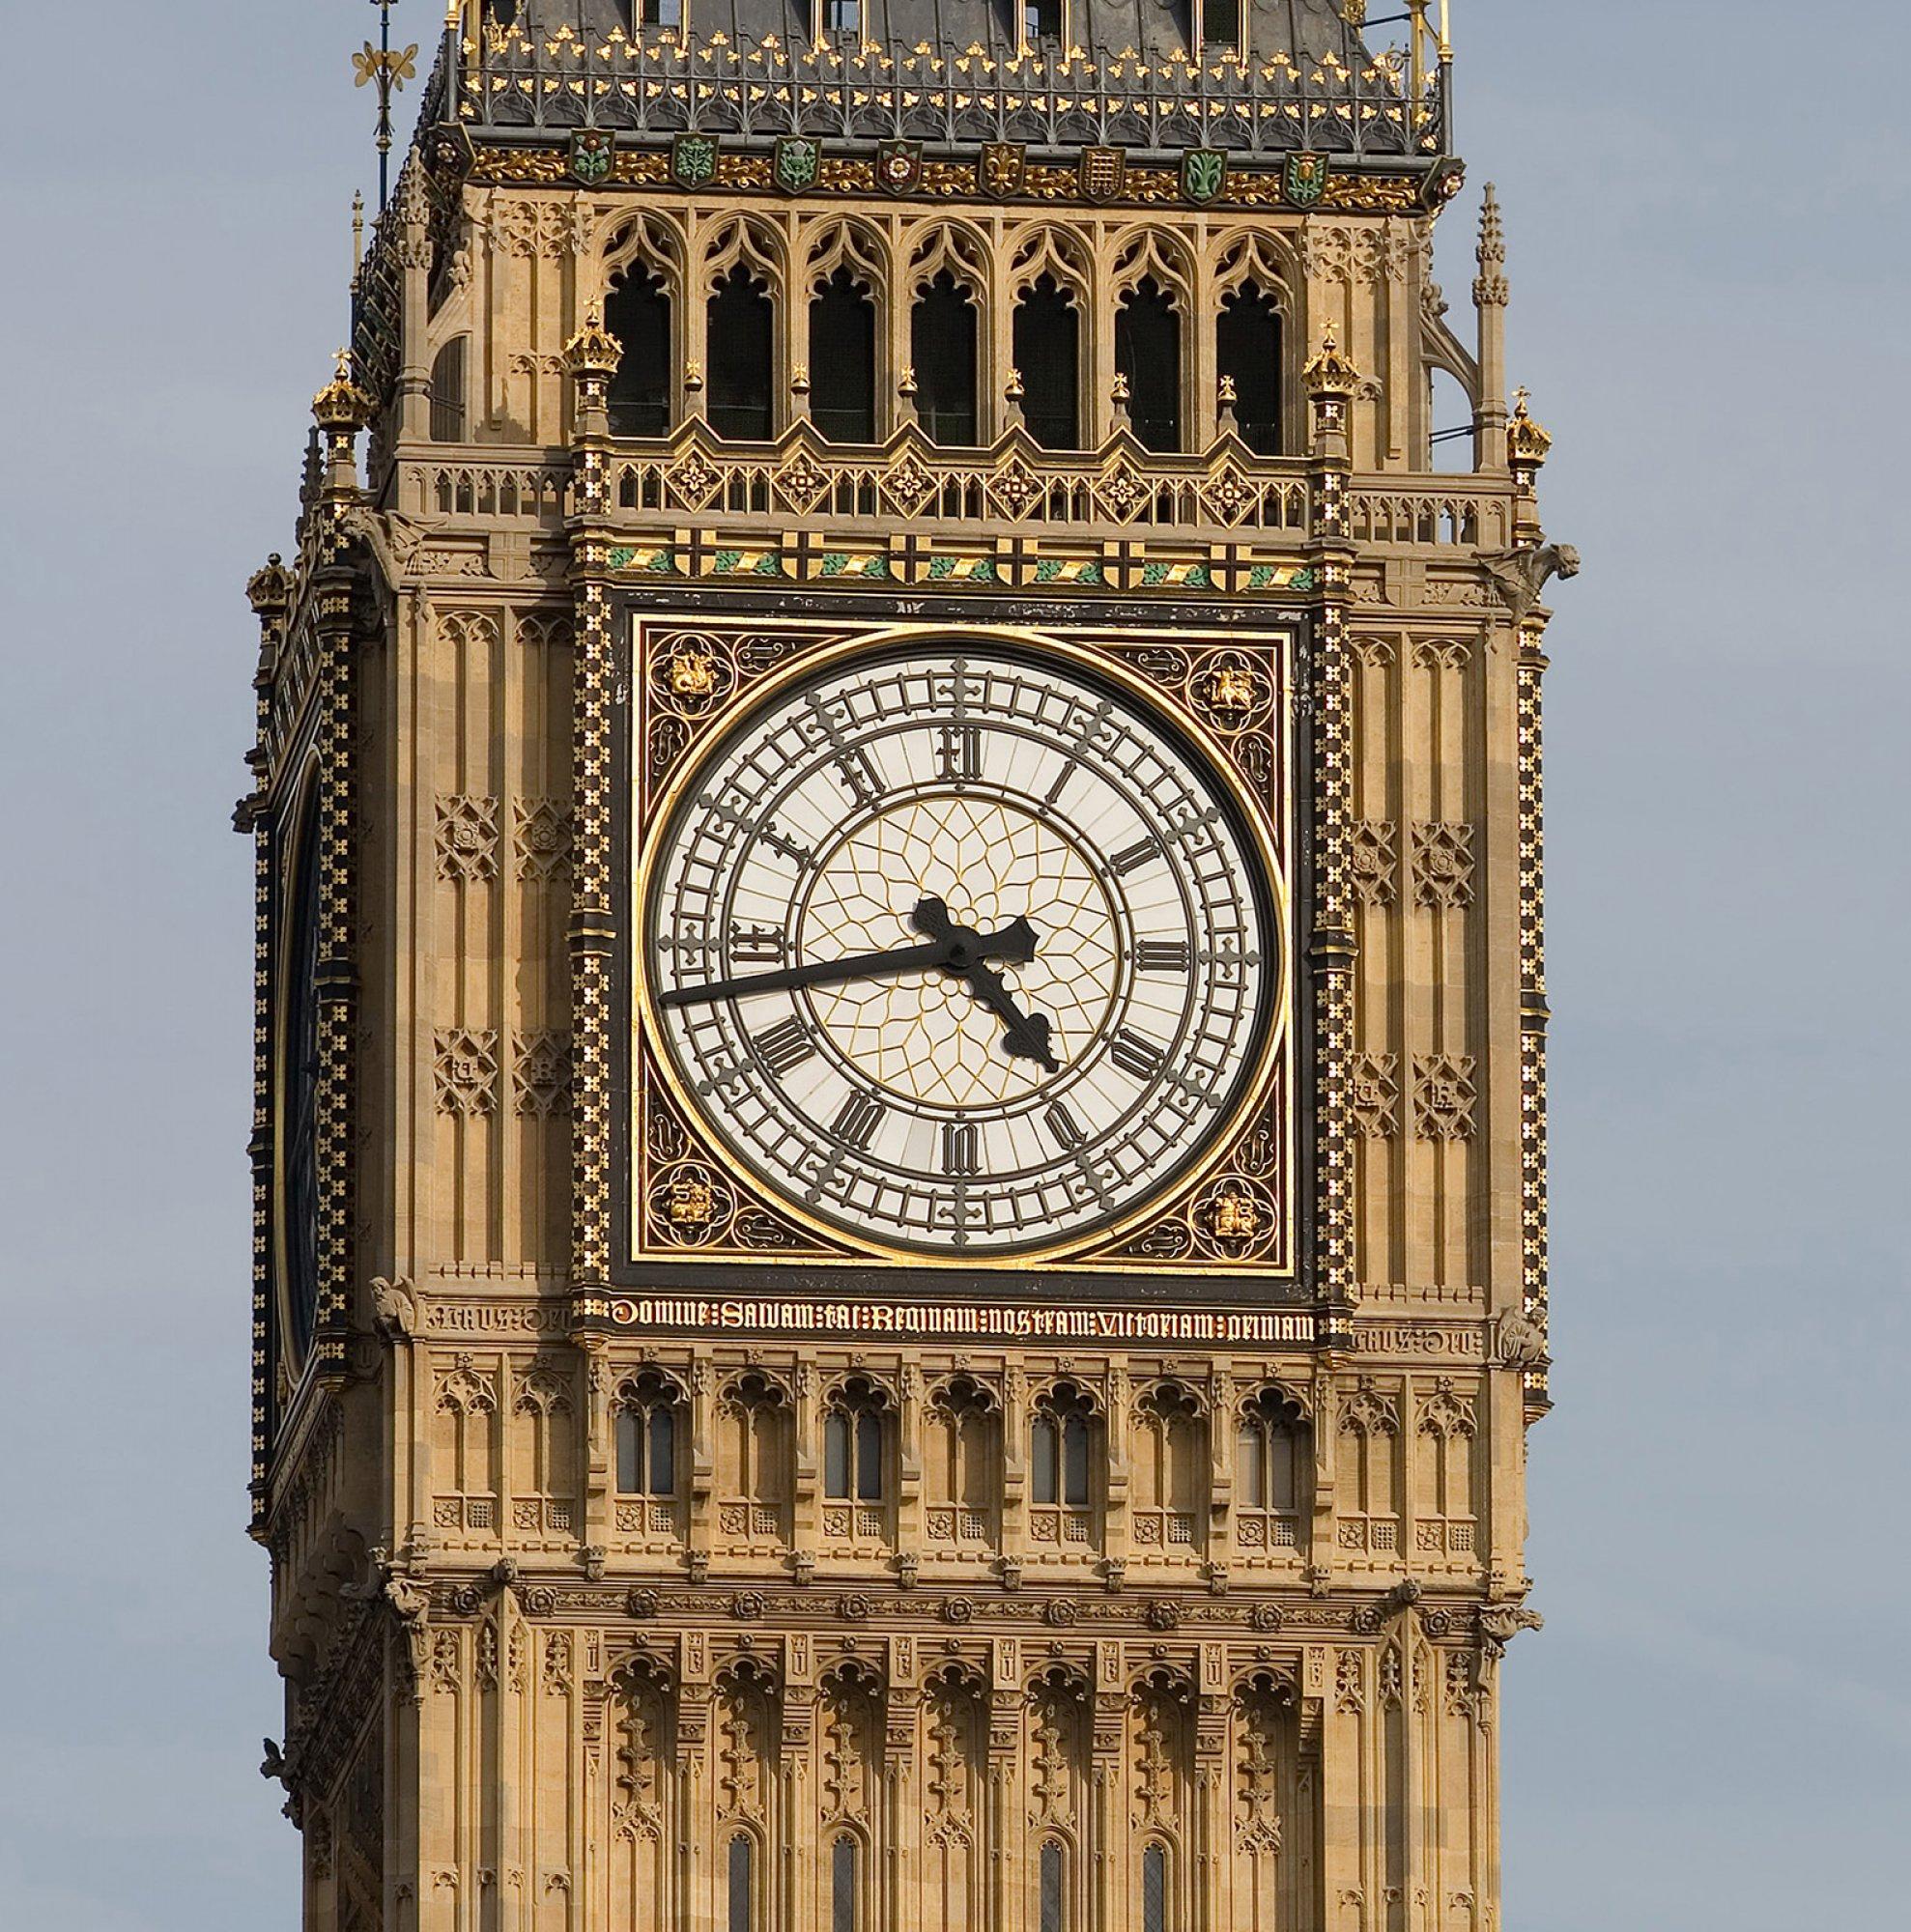 https://bubo.sk/uploads/galleries/5048/londyn-clock-tower-crop-200-.jpg